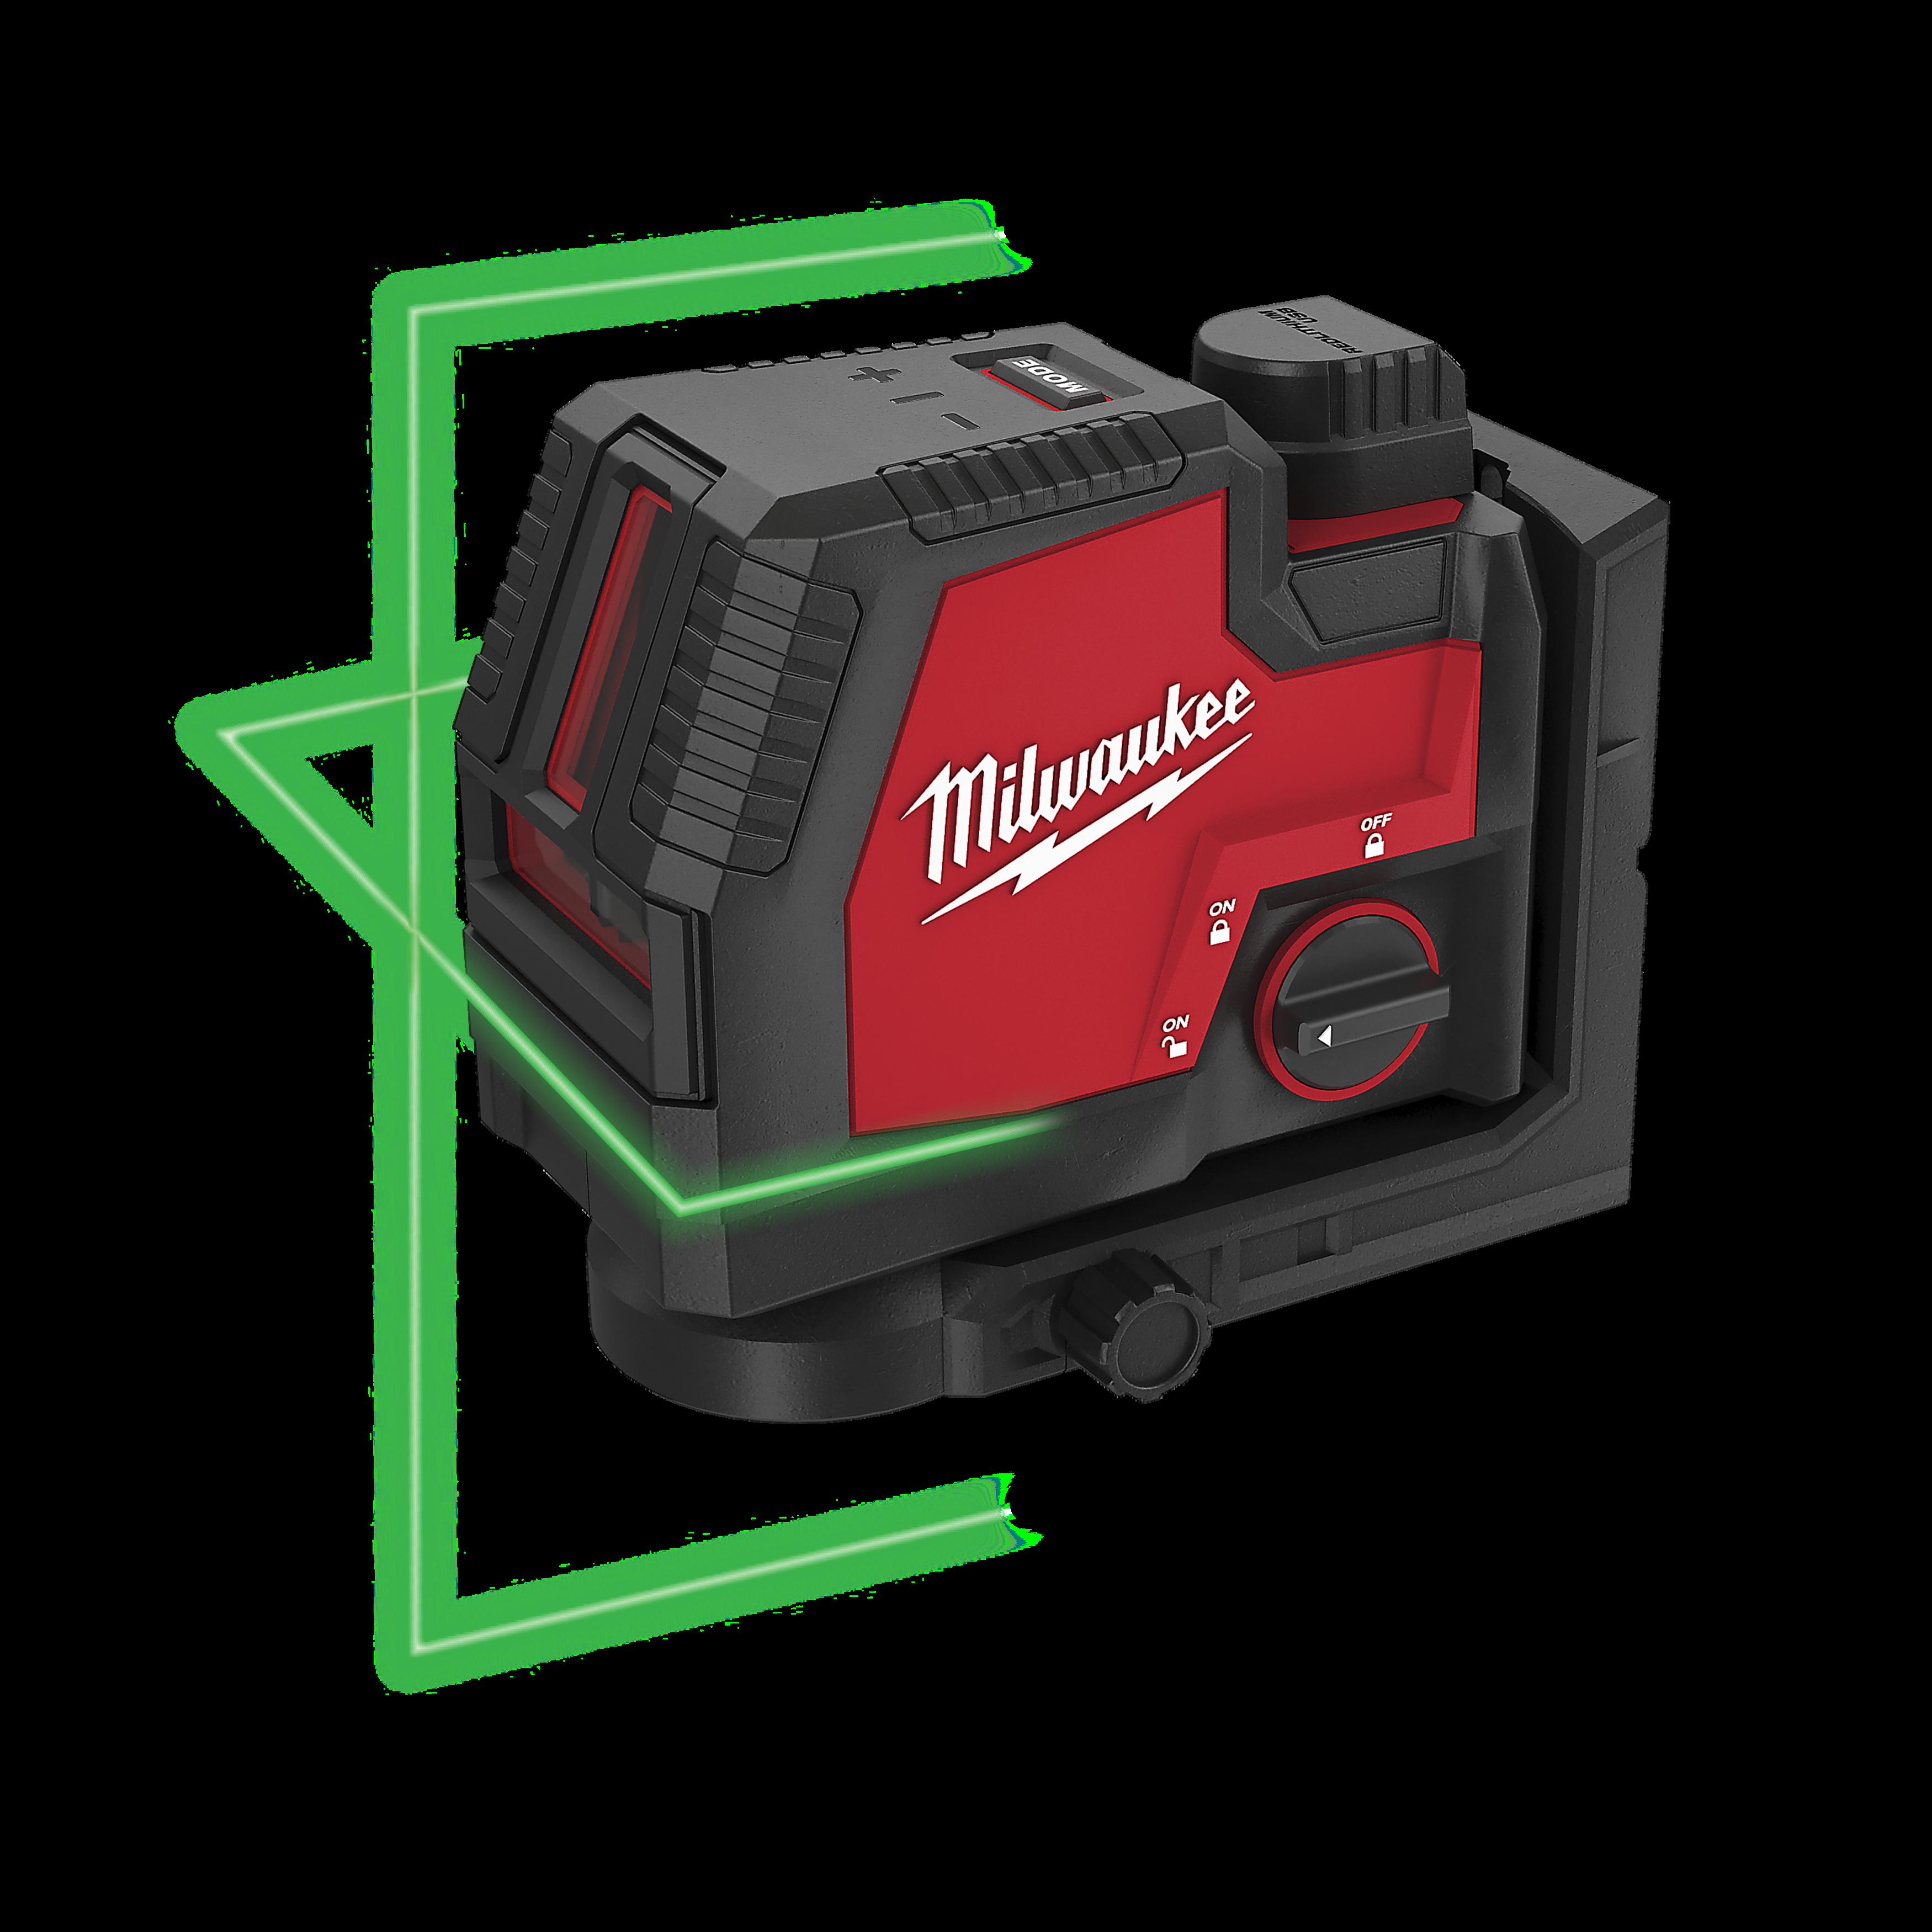 USB rechargeable green cross line laser